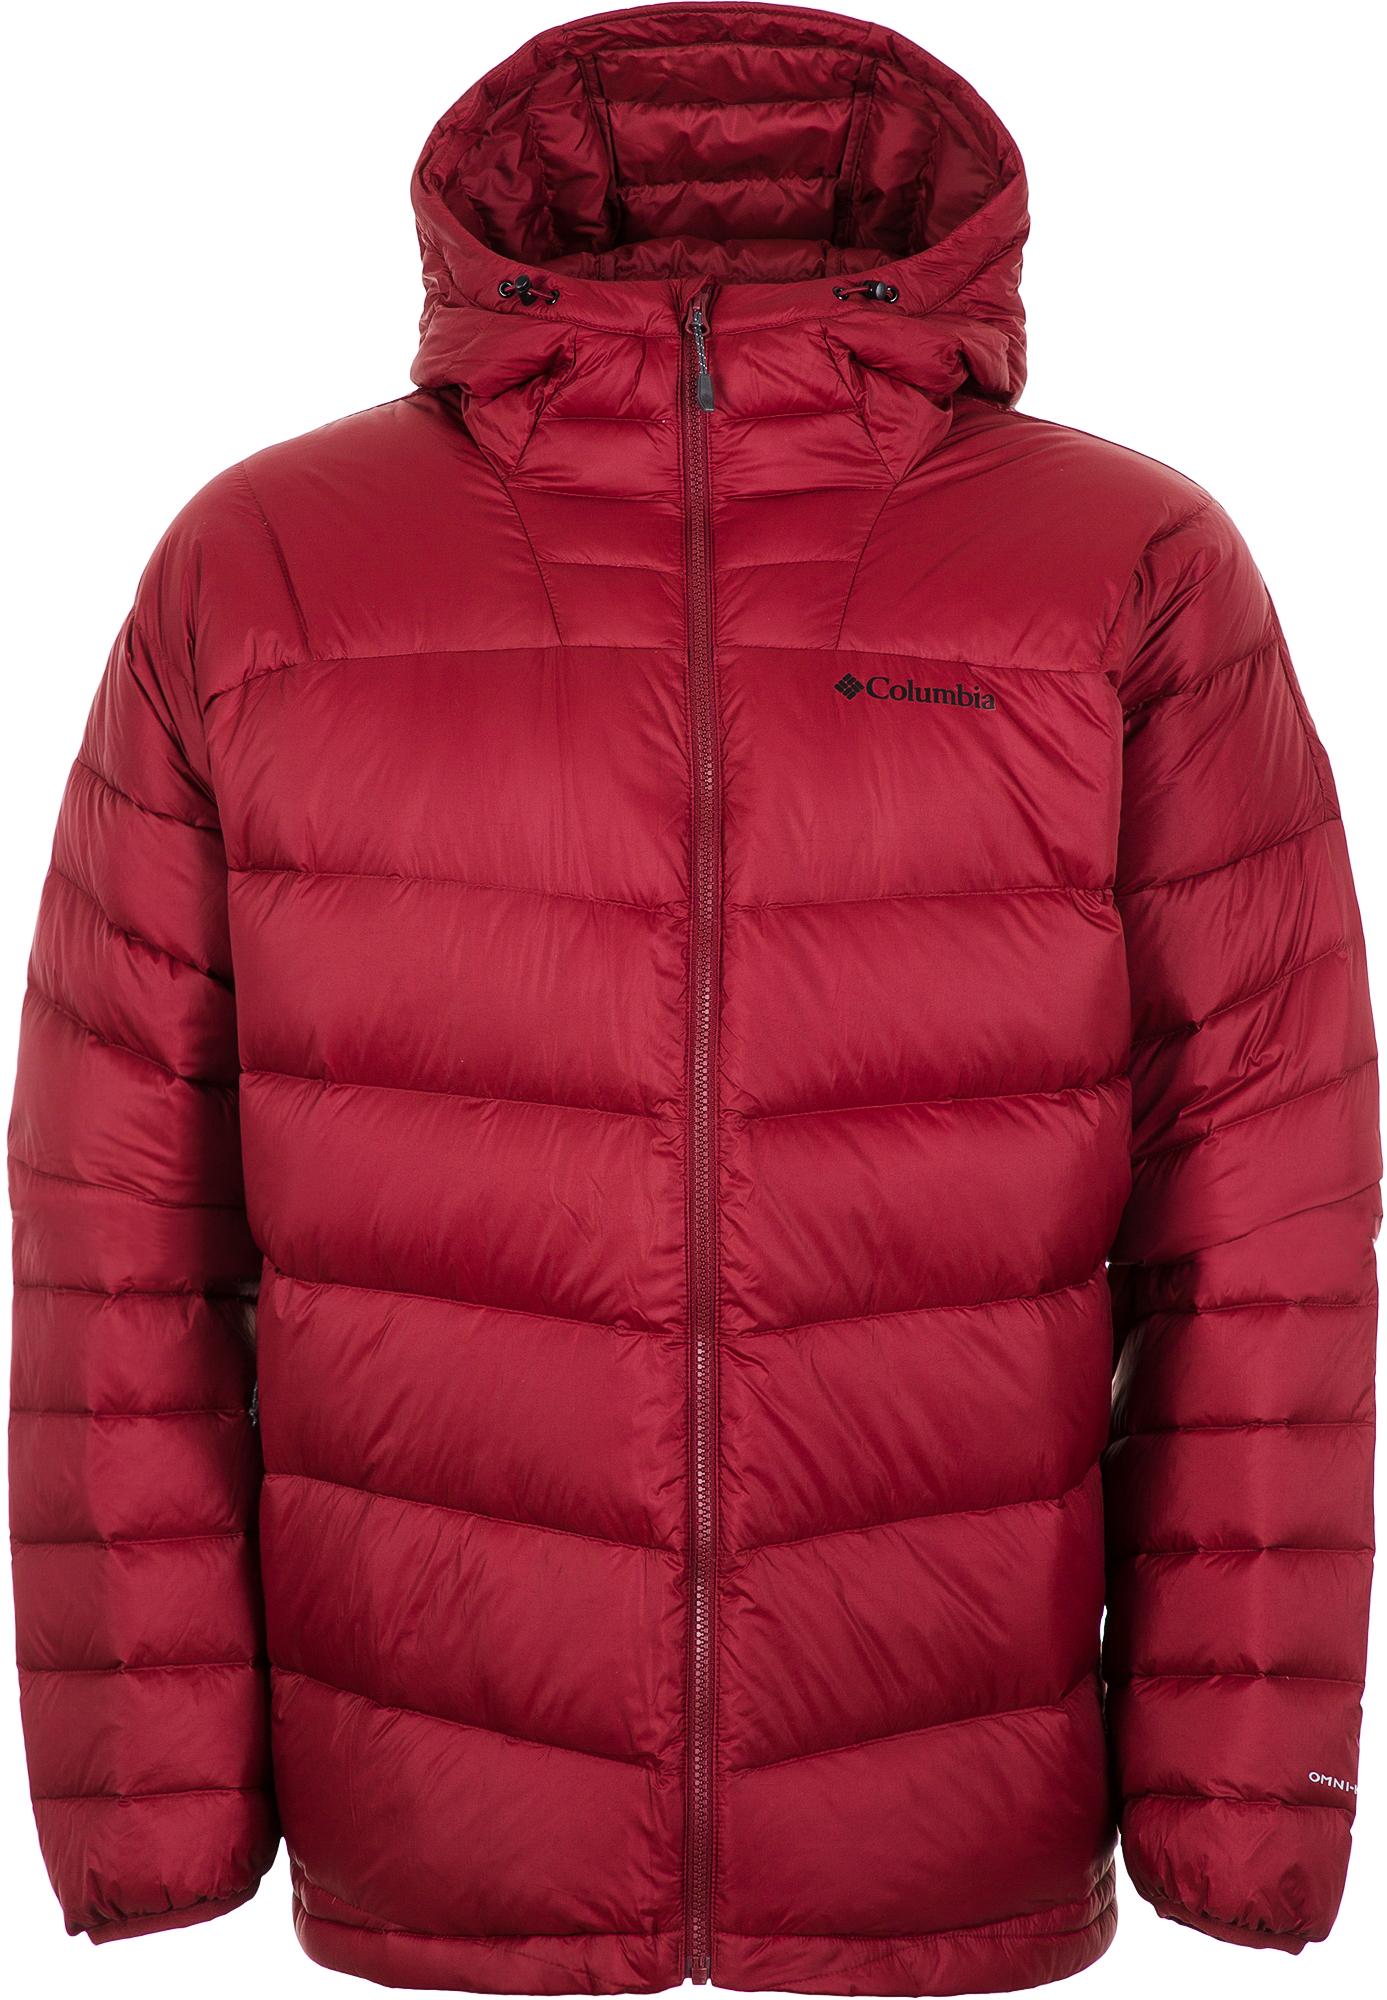 Columbia Куртка пуховая мужская Centennial Creek, размер 60-62